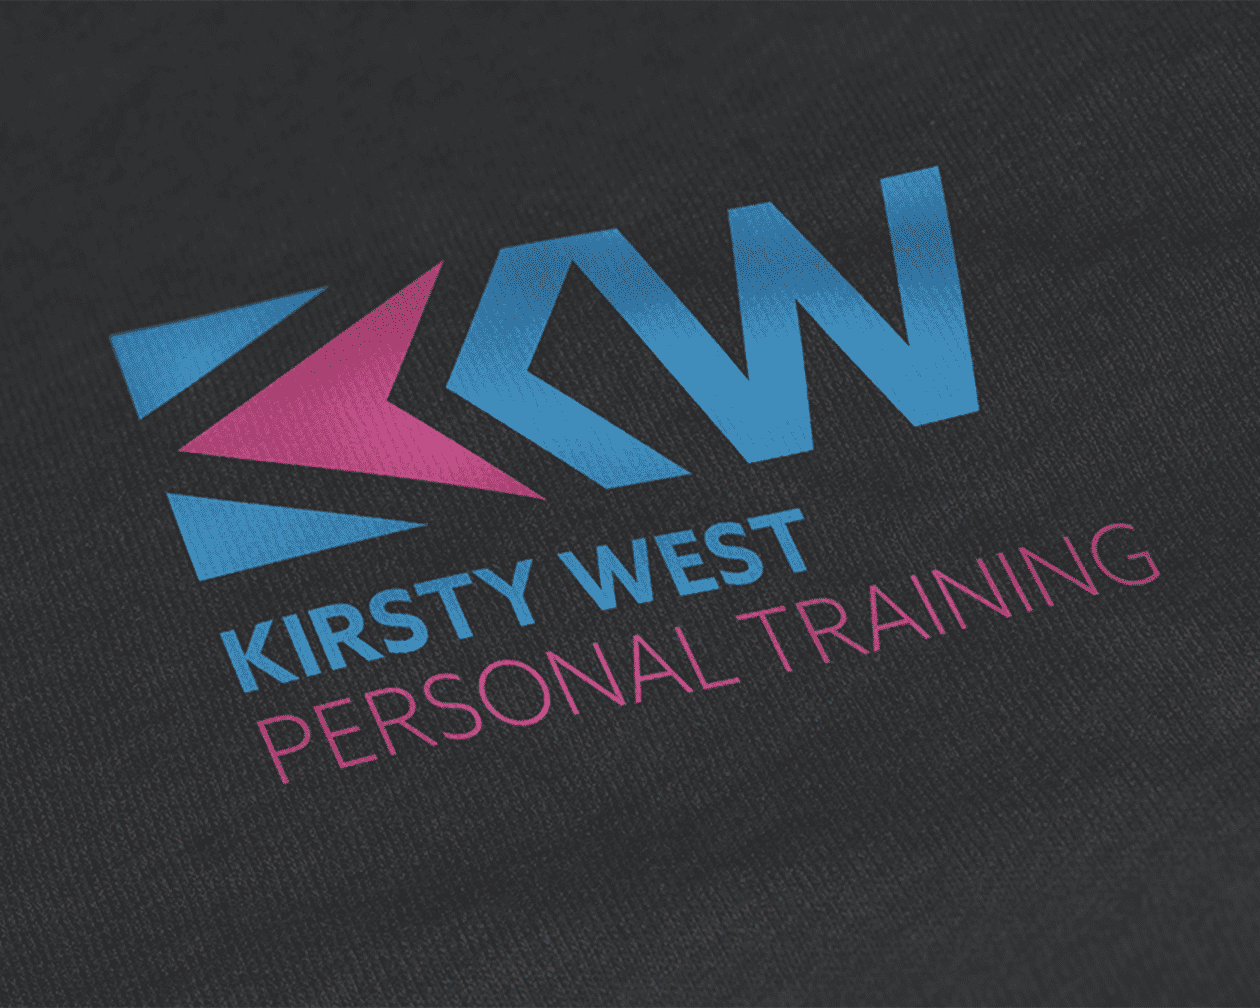 Kirsty West Logo on Cloth